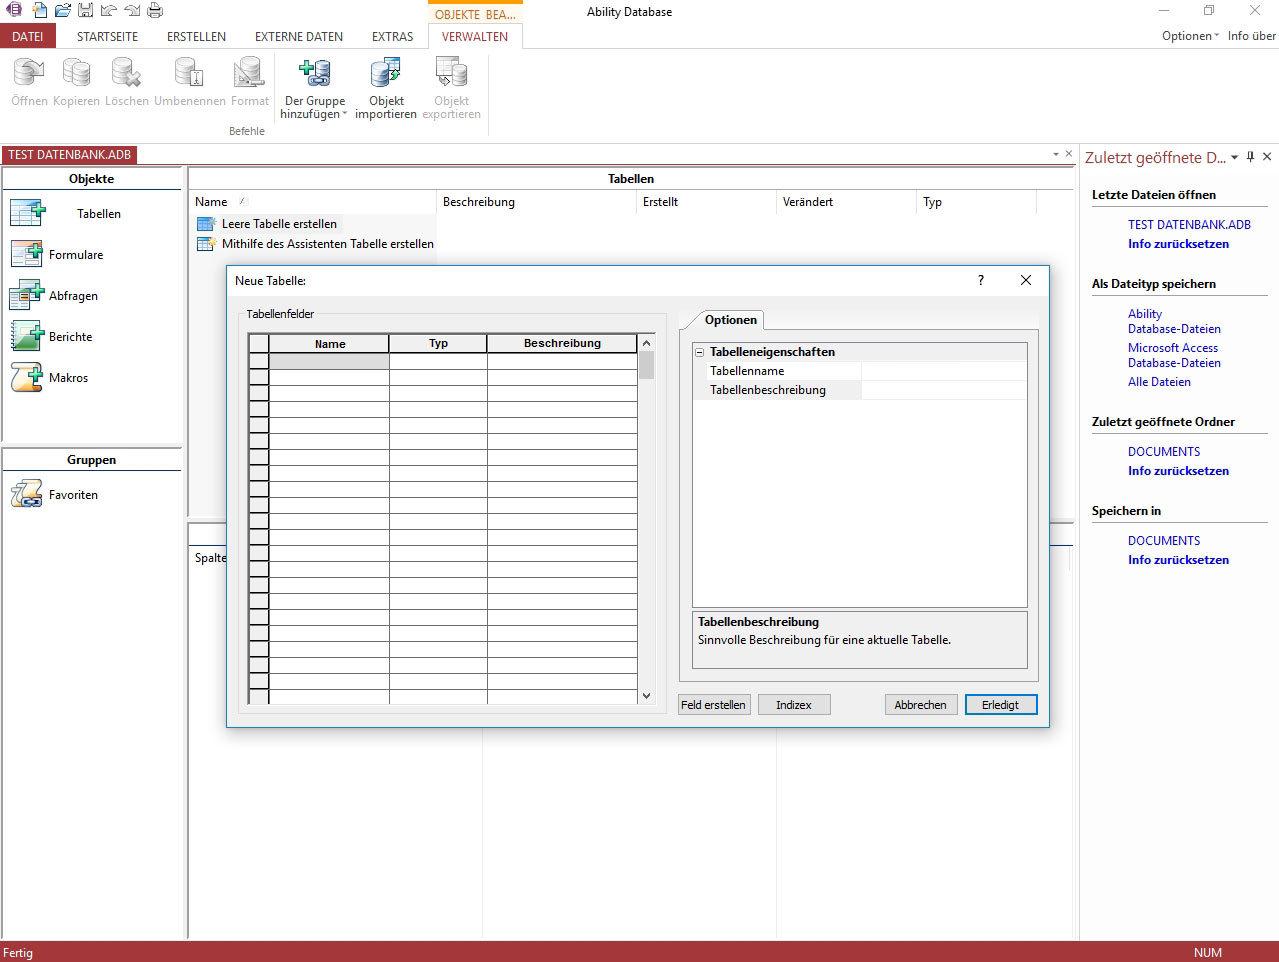 Ability Office Pro 10.0.3  [Herramienta ofimatica sin igual] [Ingles] [UL.IO] Nxw5db2f2750cd7f